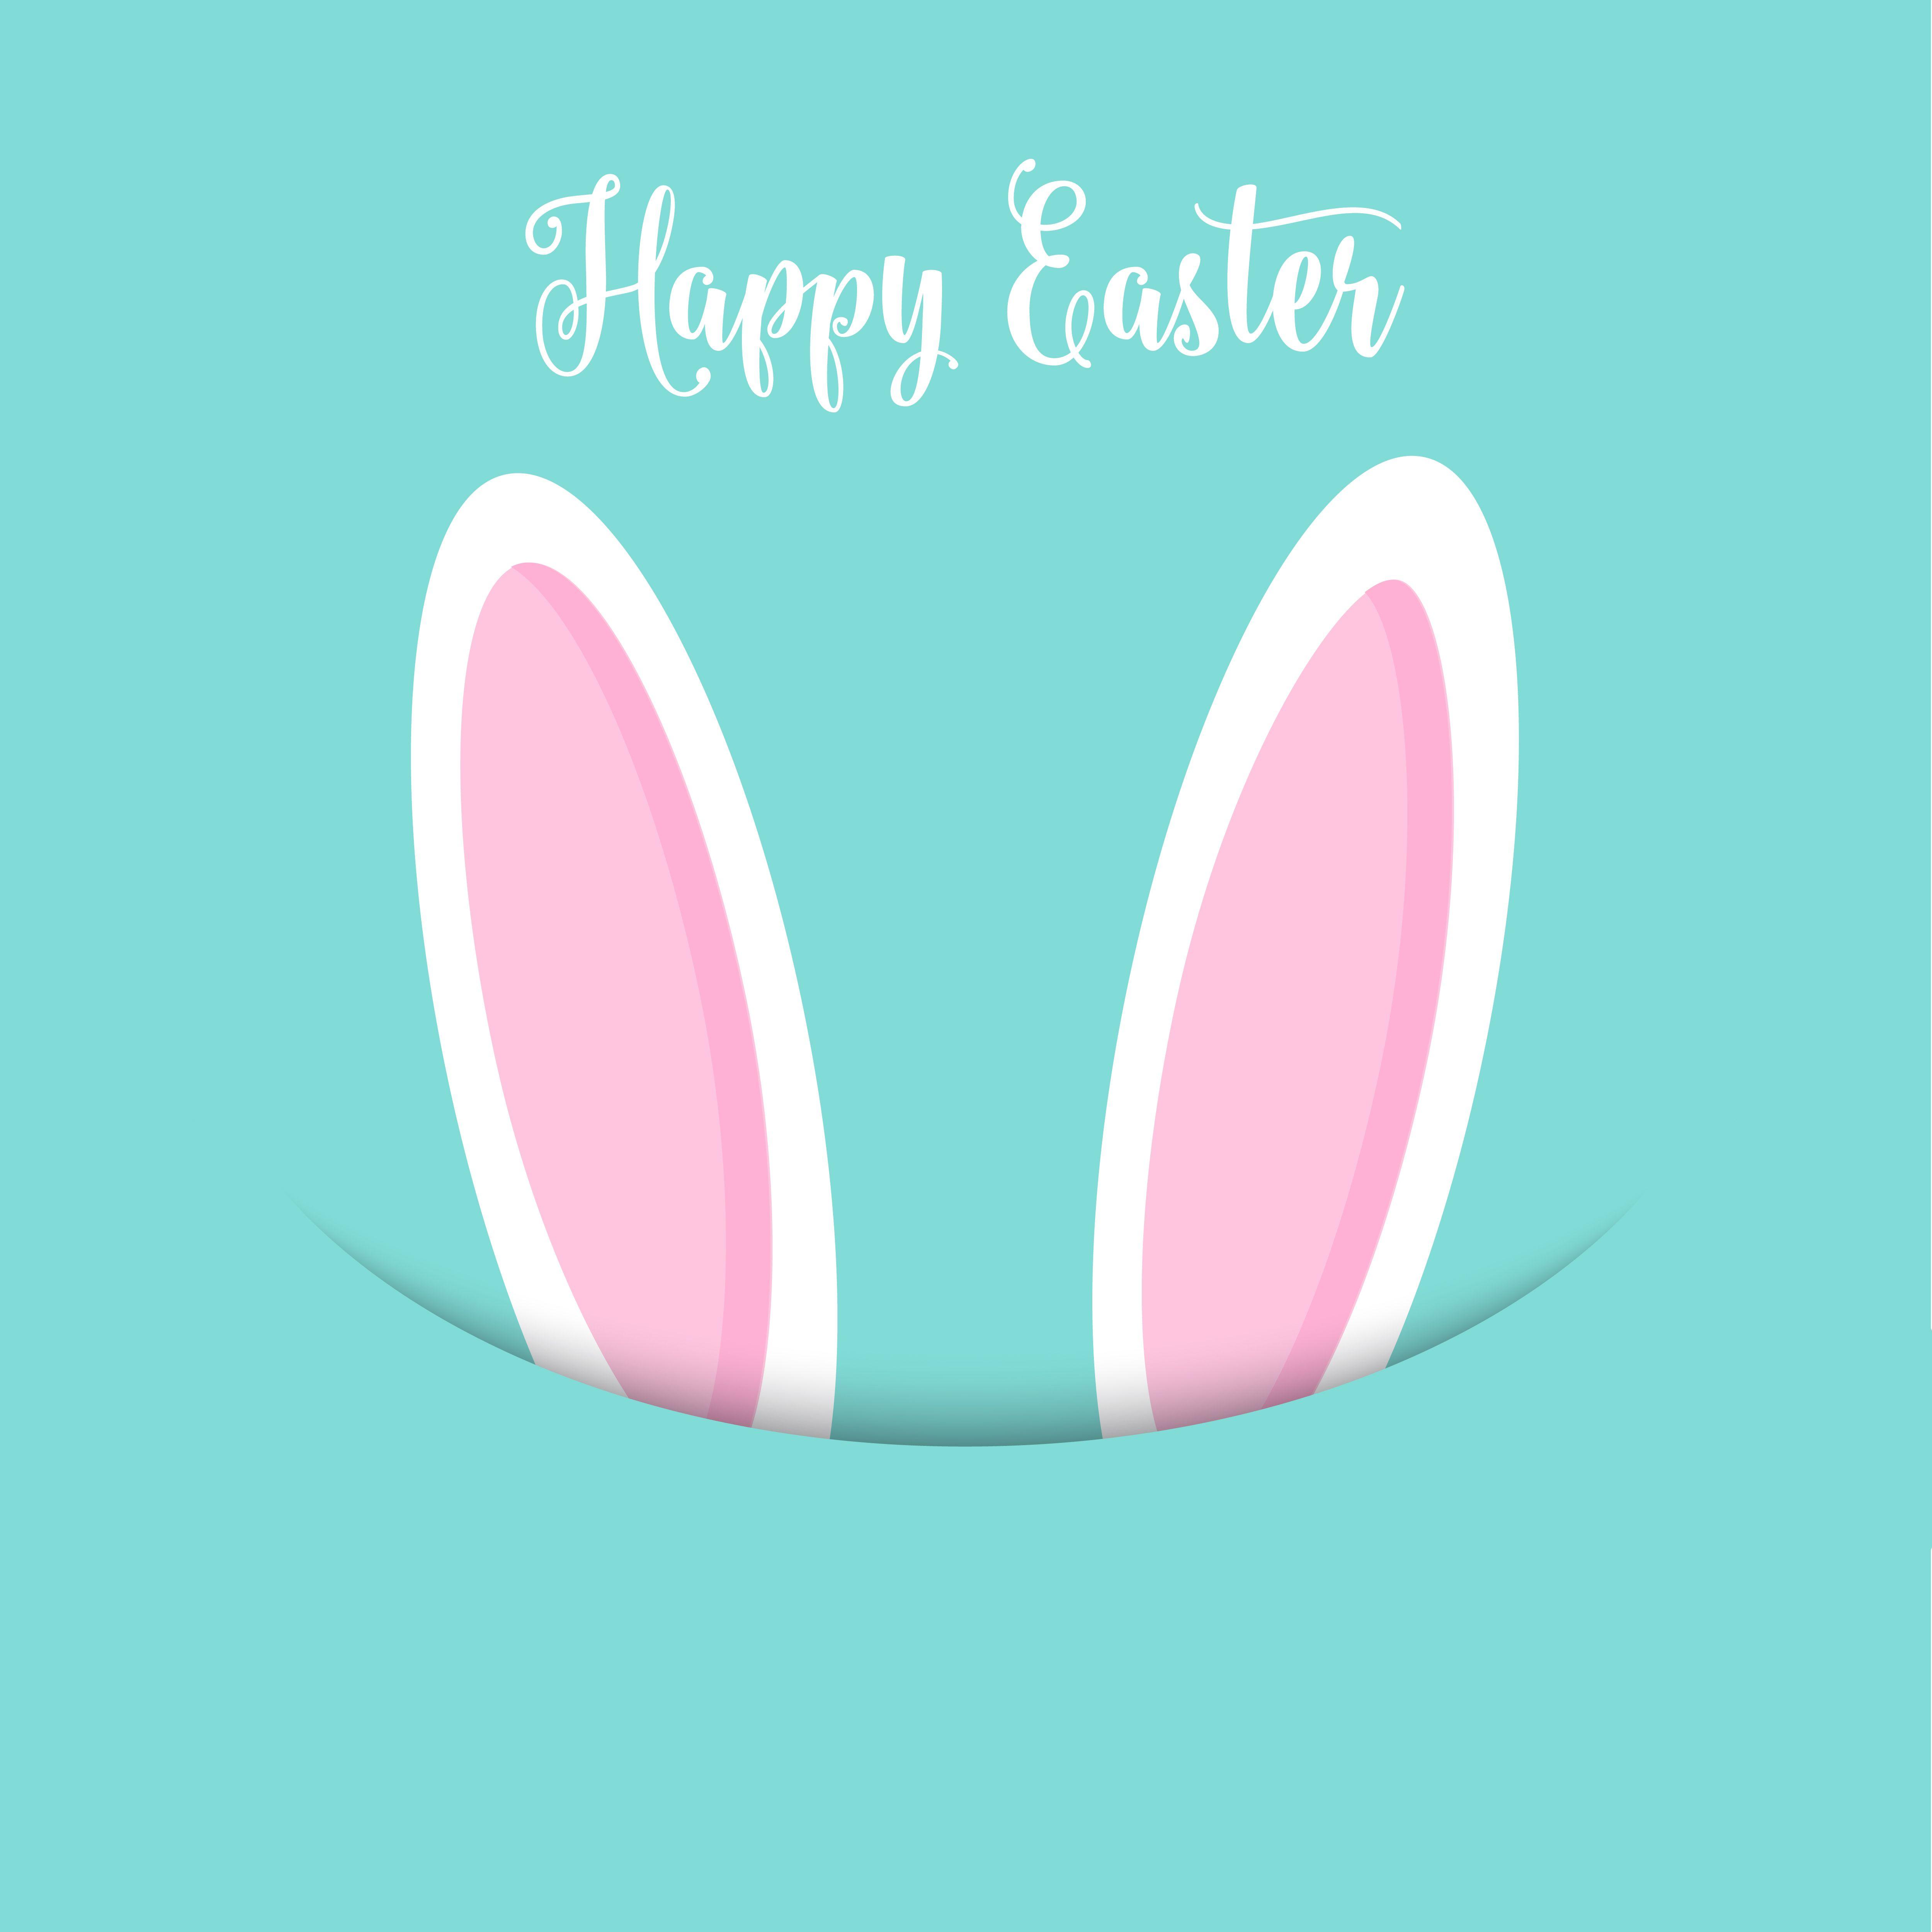 Bonuses Promotions News Casinotopsonline Com Easter Backgrounds Easter Bunny Ears Easter Poster